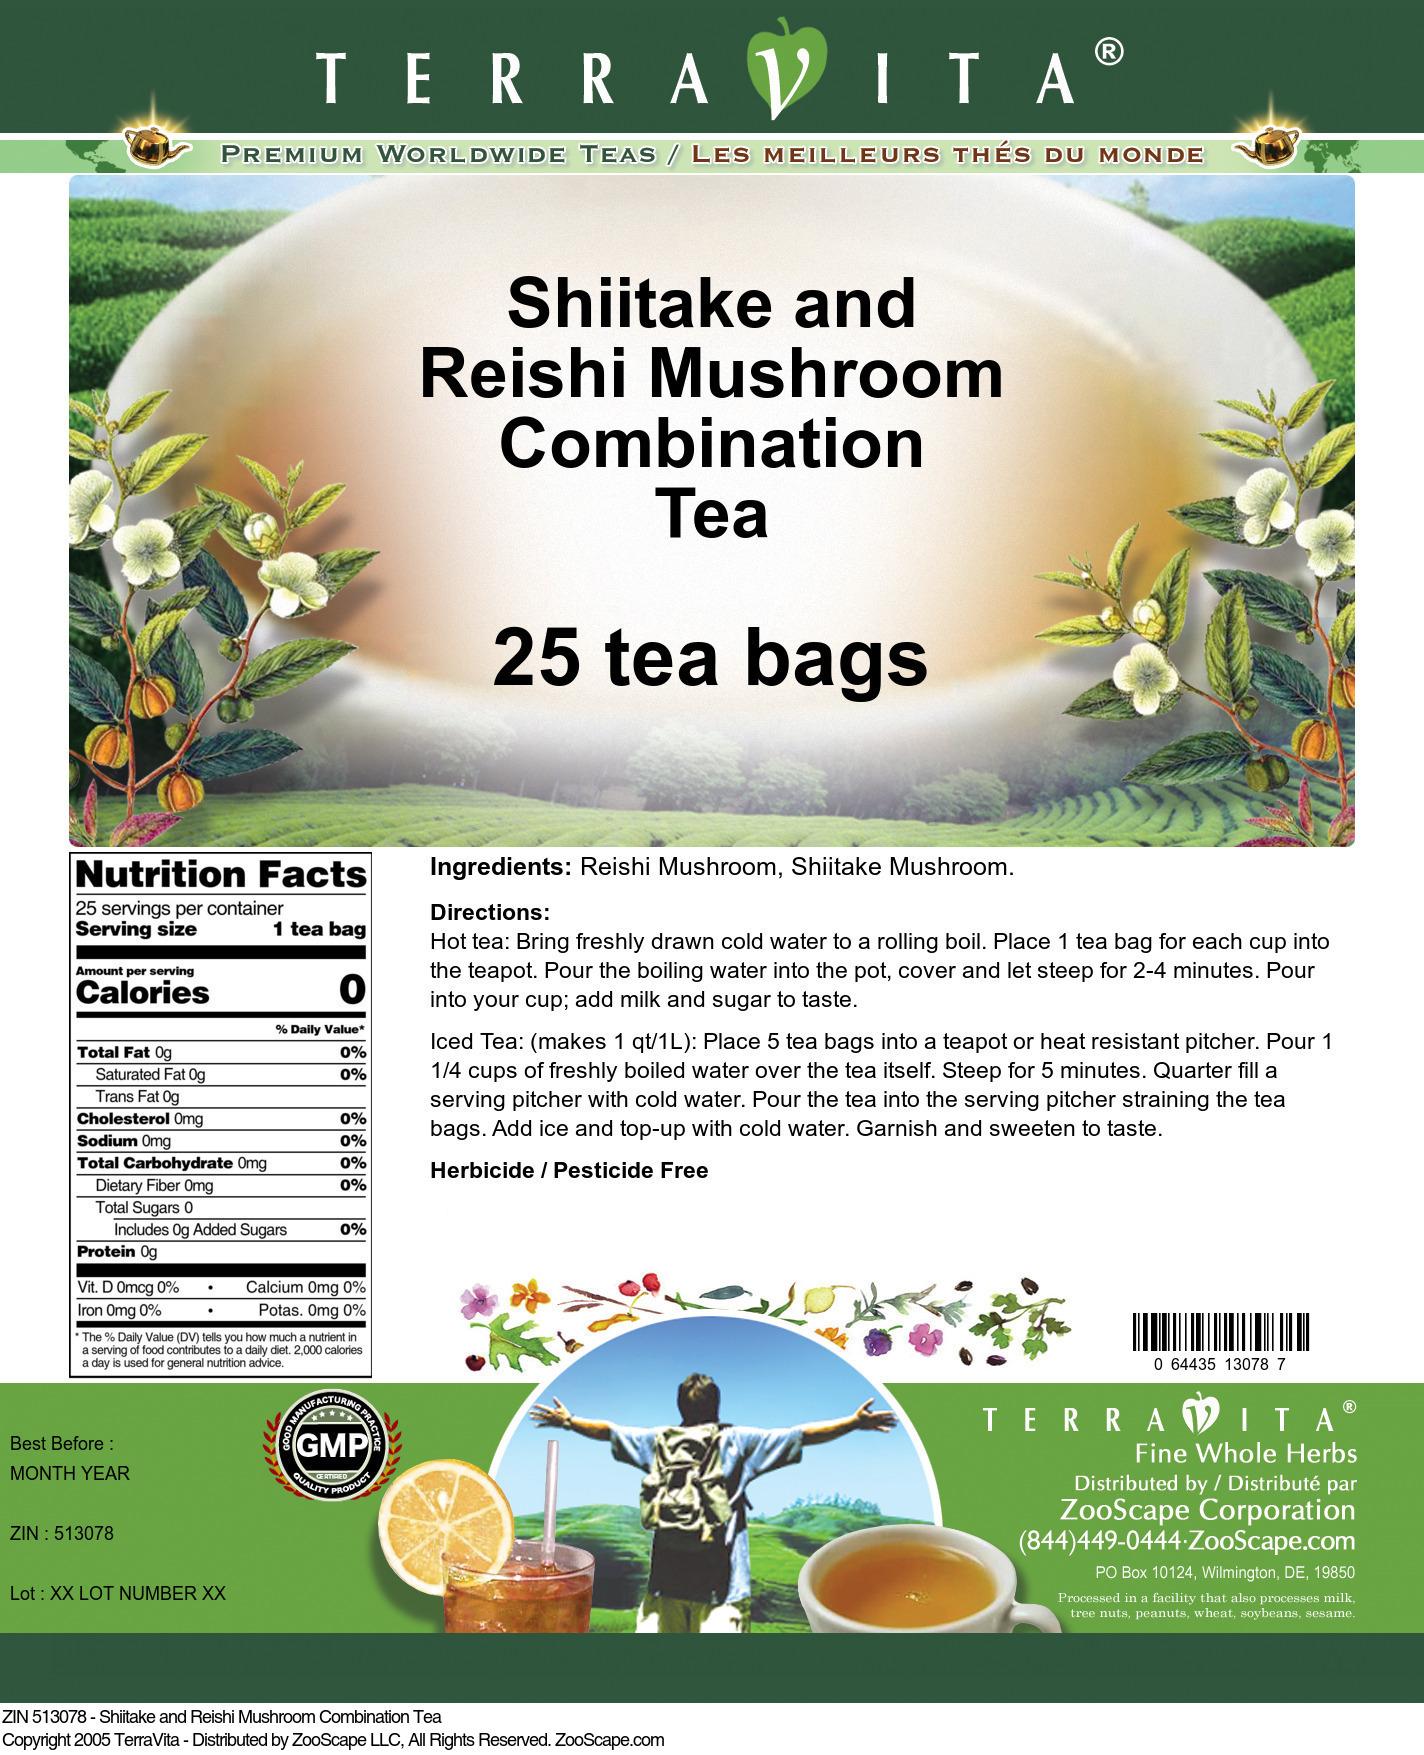 Shiitake and Reishi Mushroom Combination Tea